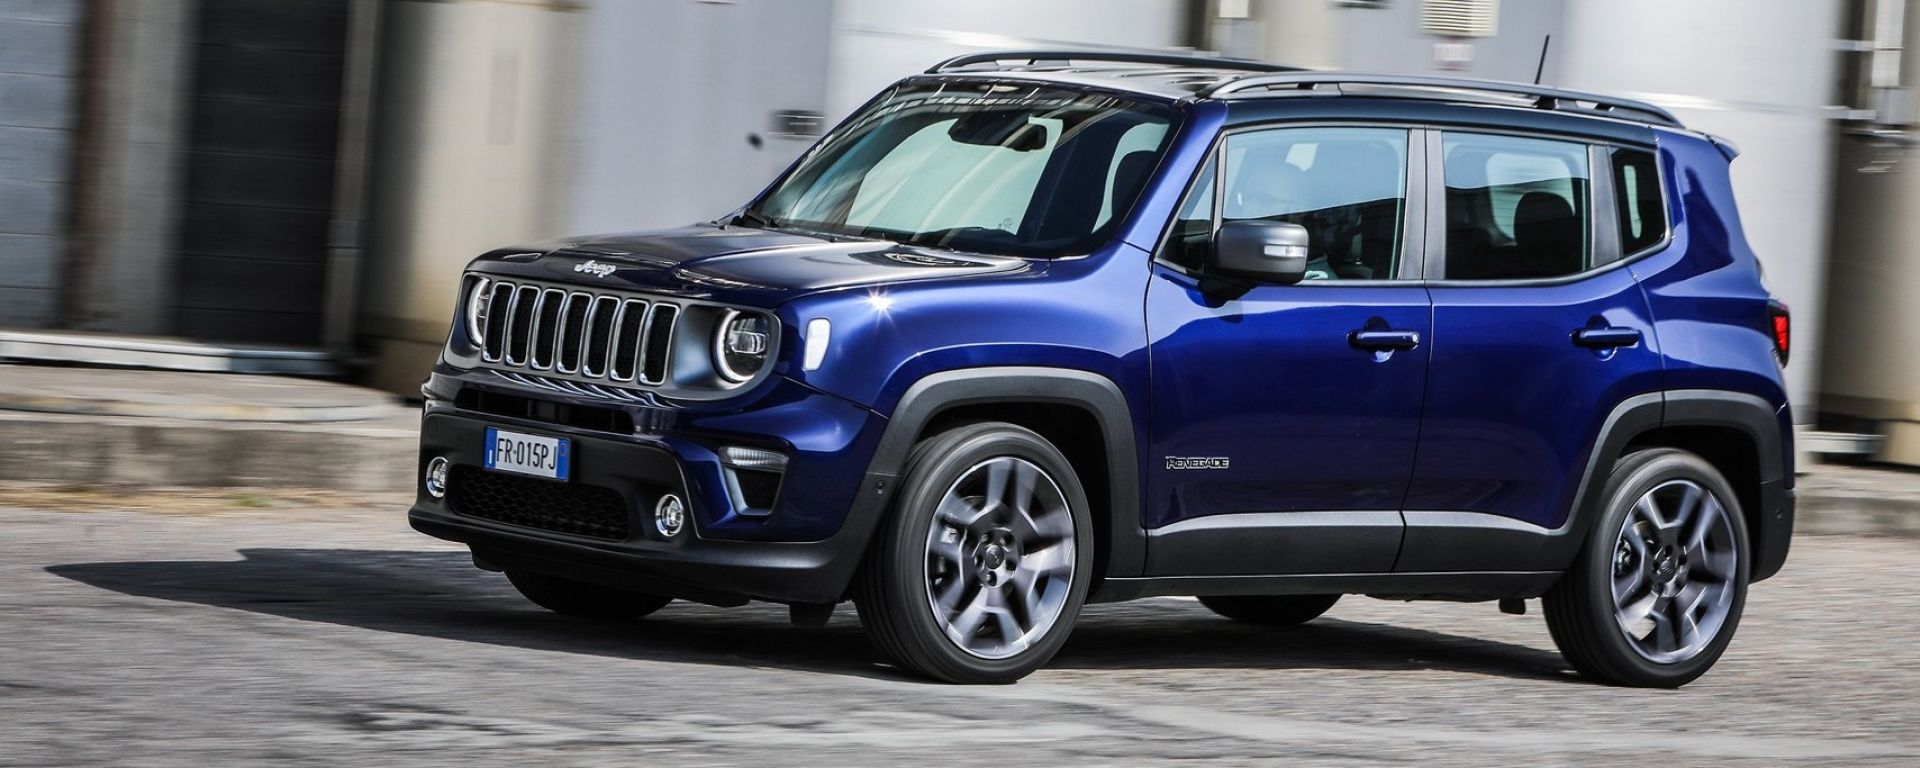 Jeep Renegade 2019: meglio acquistarla o noleggiarla?